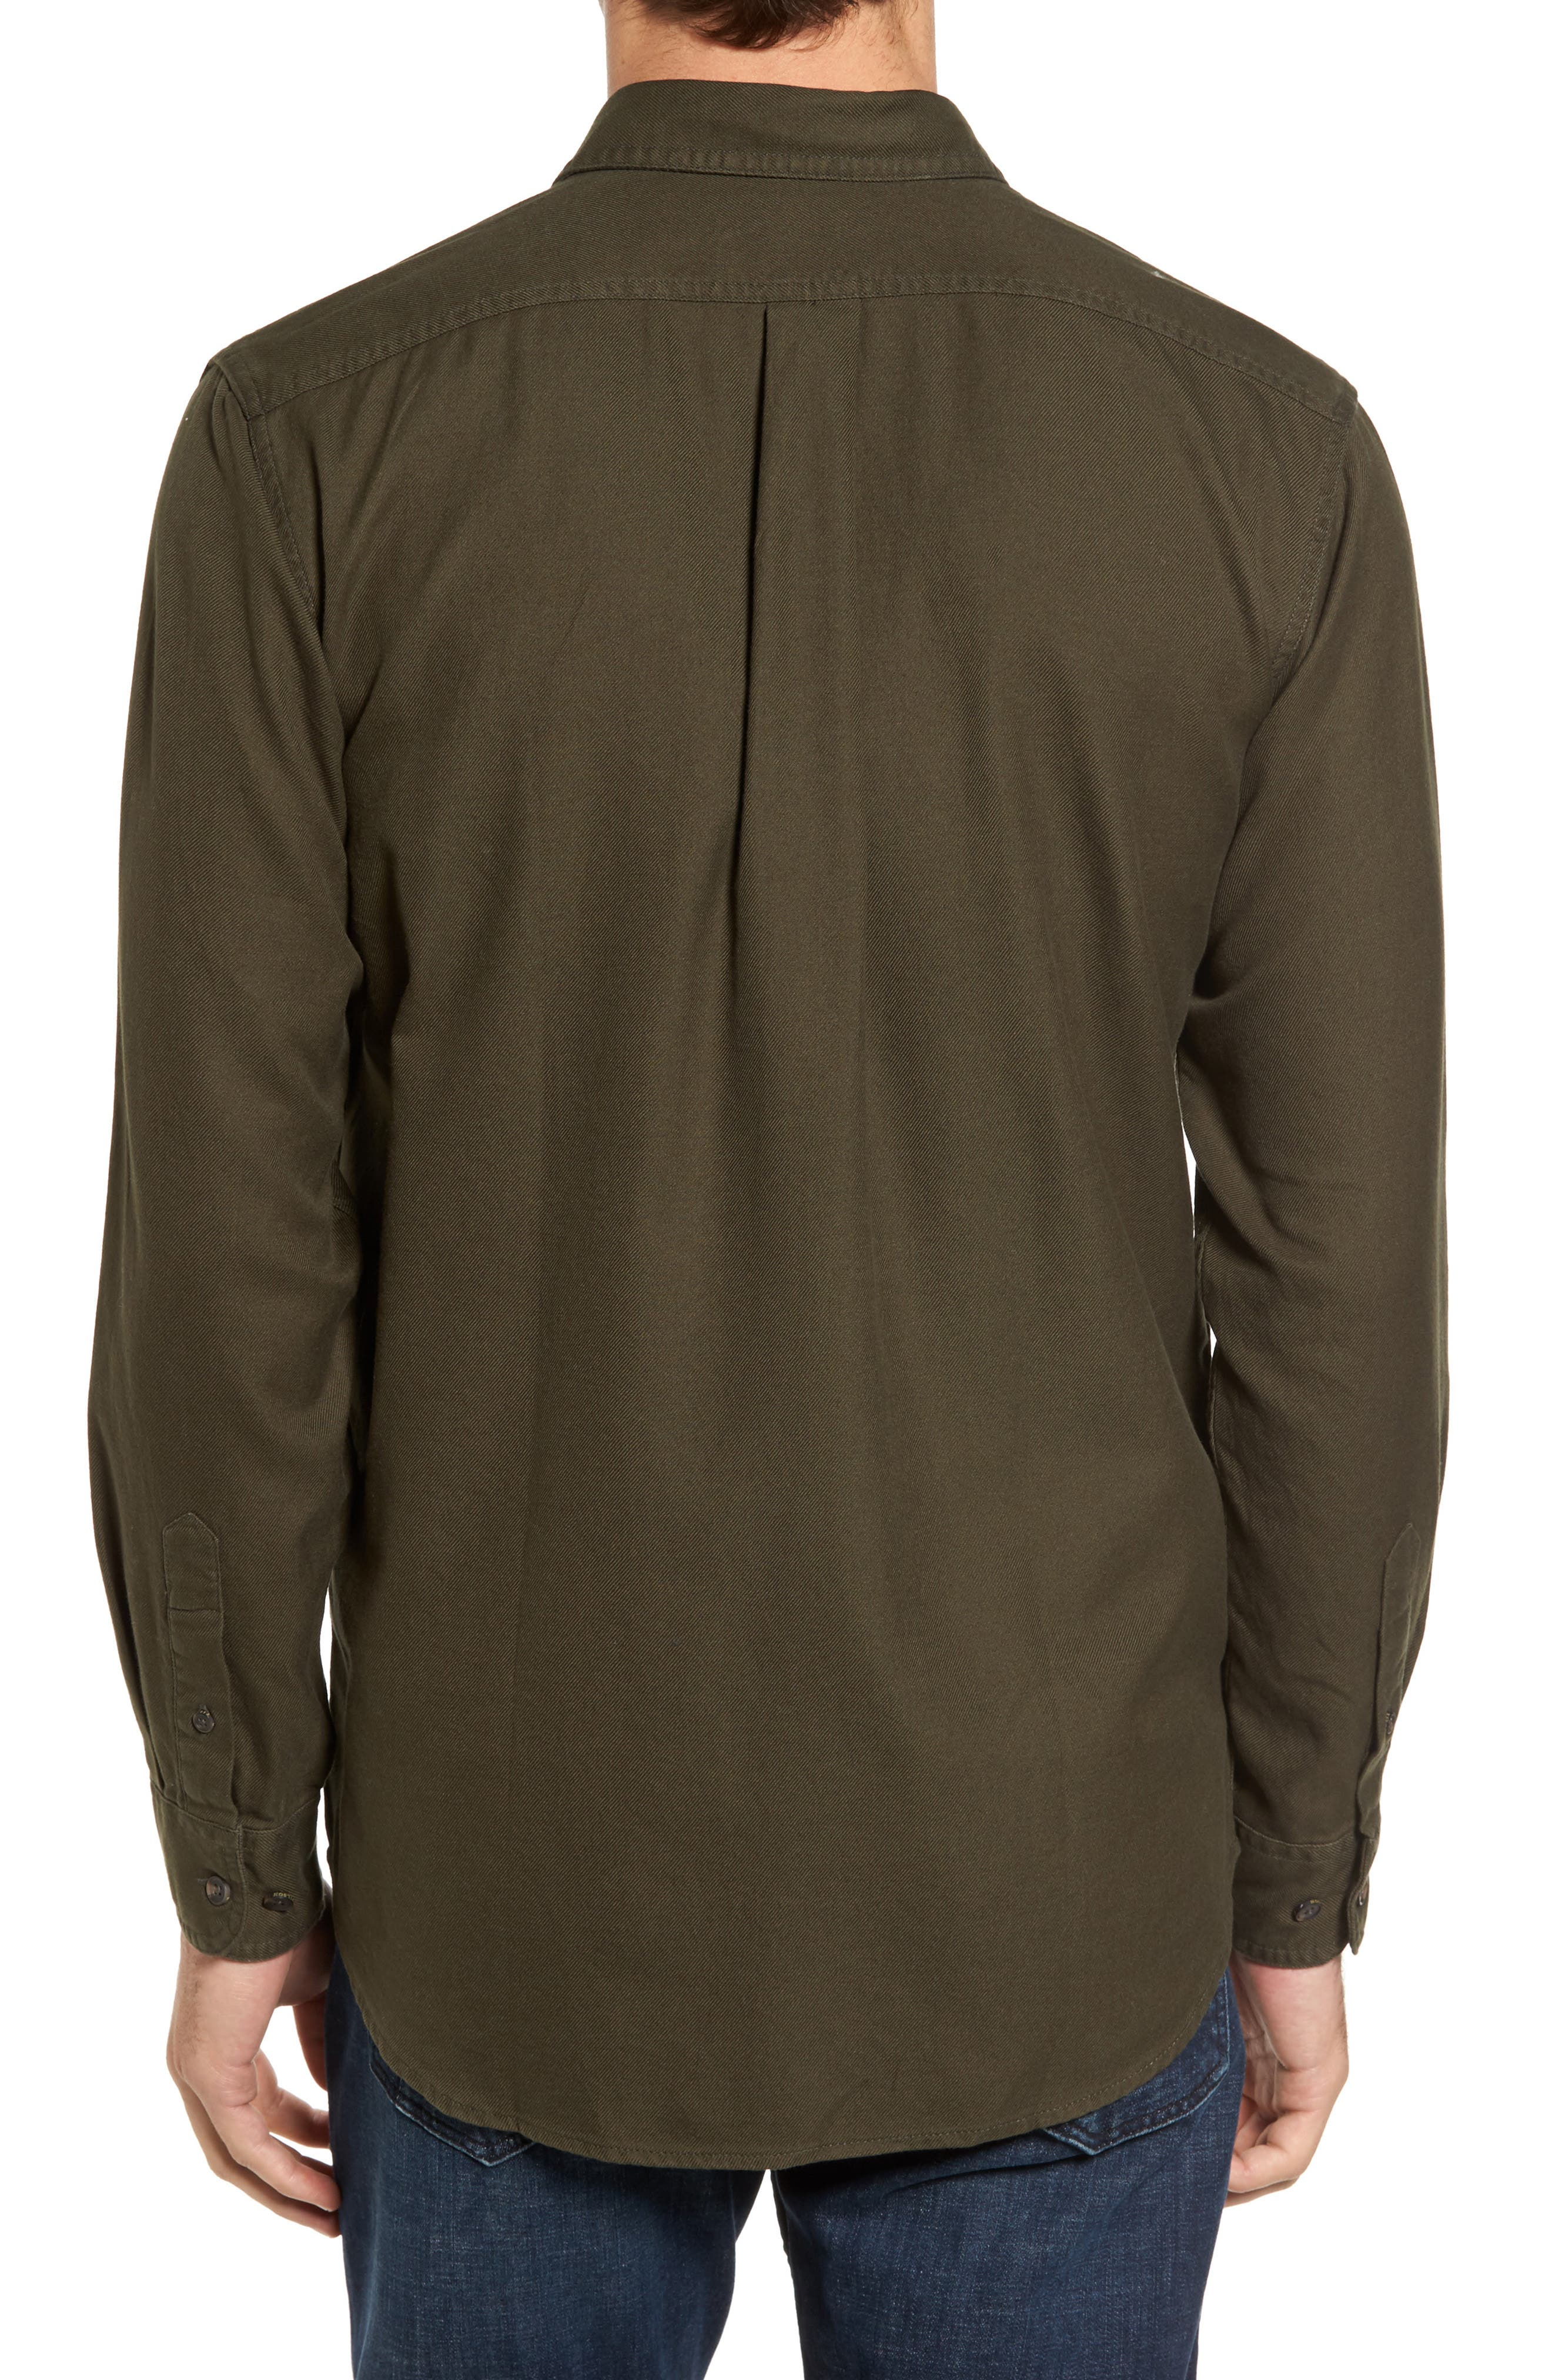 Alaskan Guide Regular Fit Twill Shirt,                             Alternate thumbnail 2, color,                             Brunswick Green